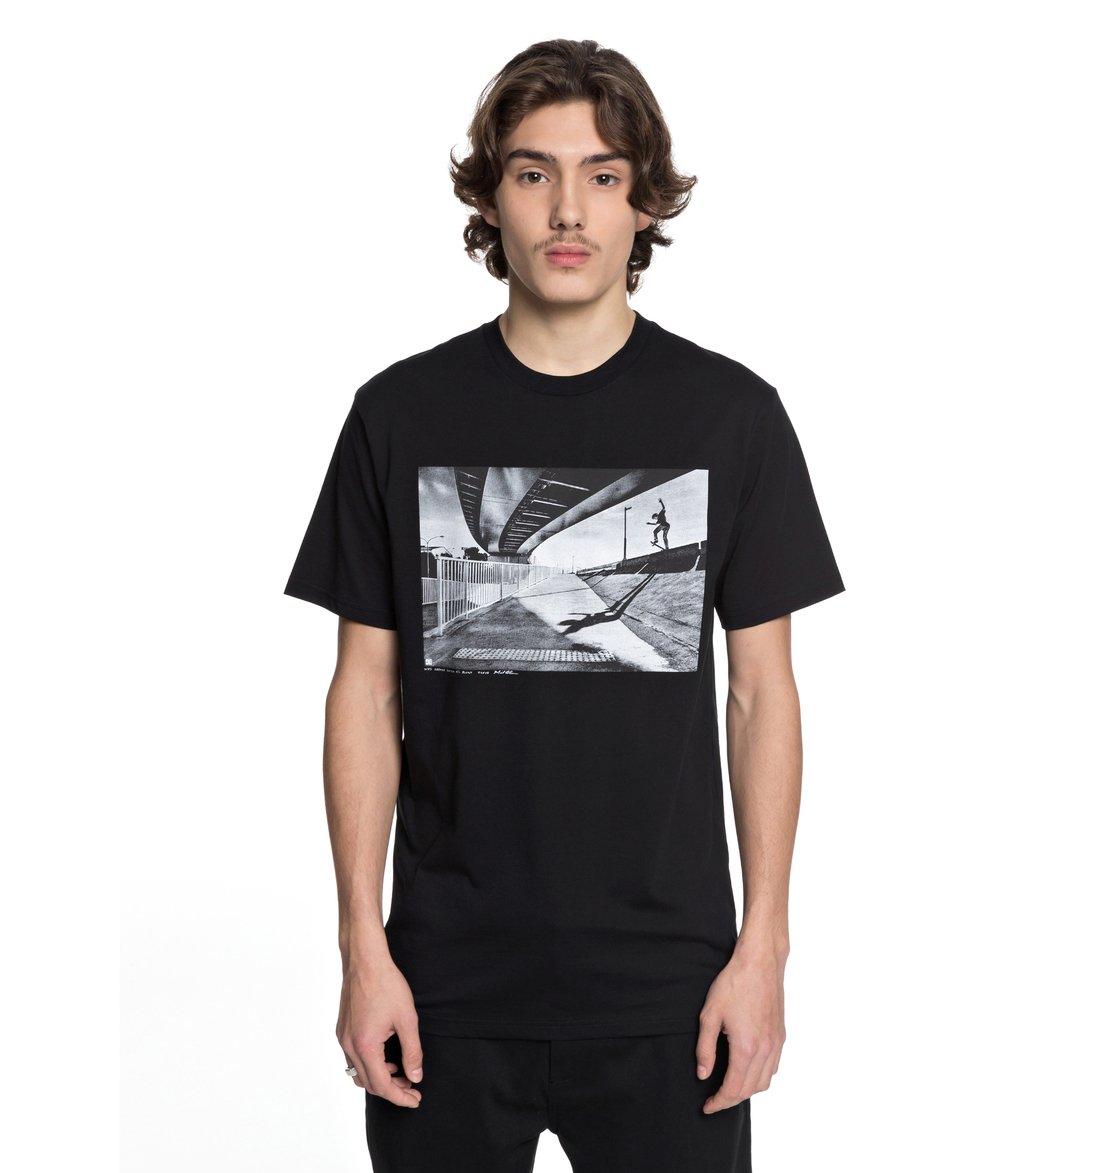 dc shoes Wes Switch Blunt - Maglietta da Uomo - Black - DC Shoes